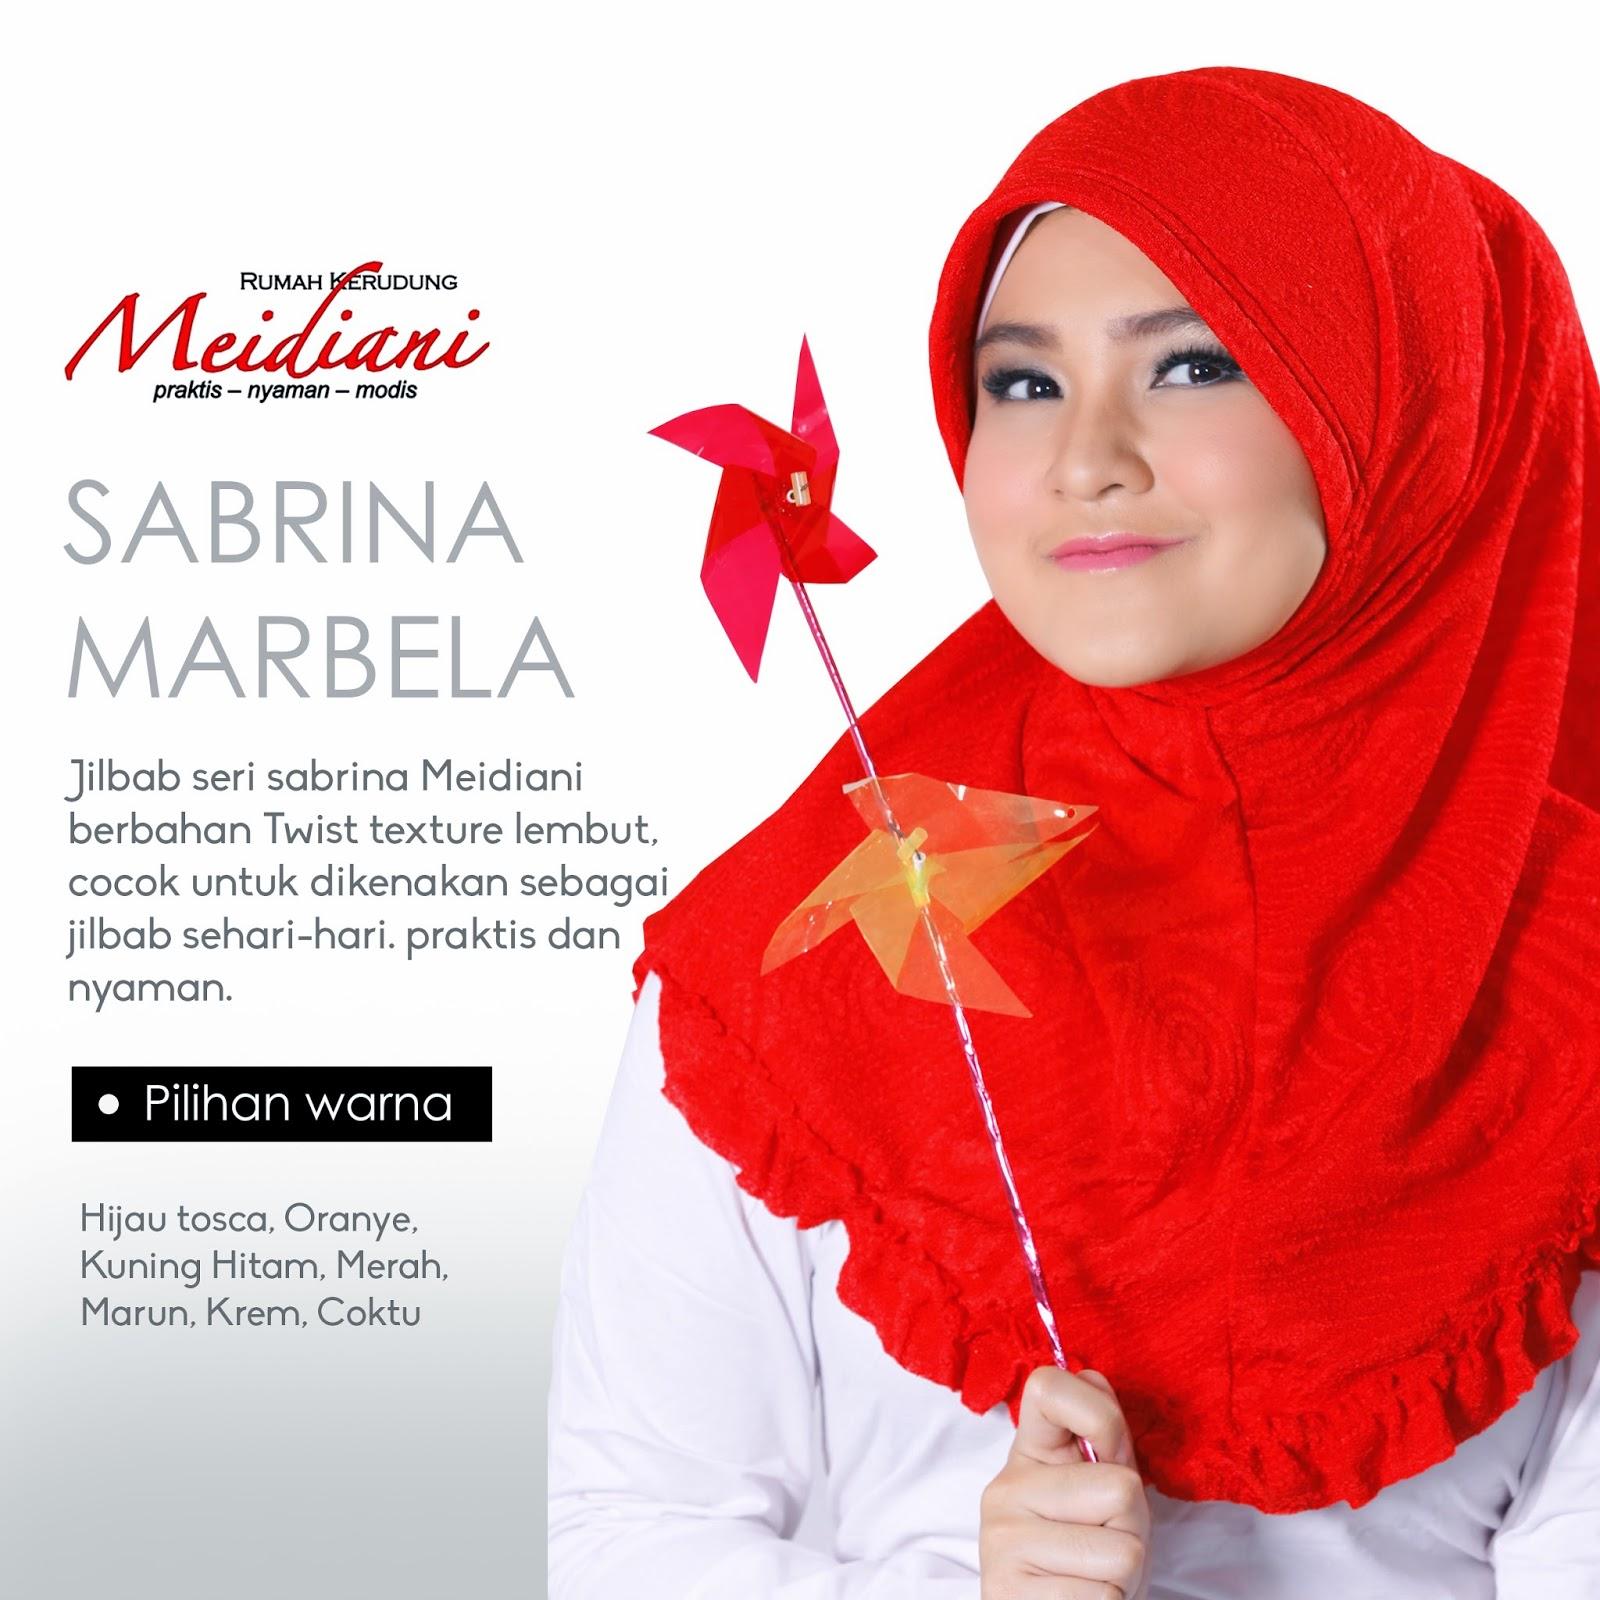 Sabrina Marbela